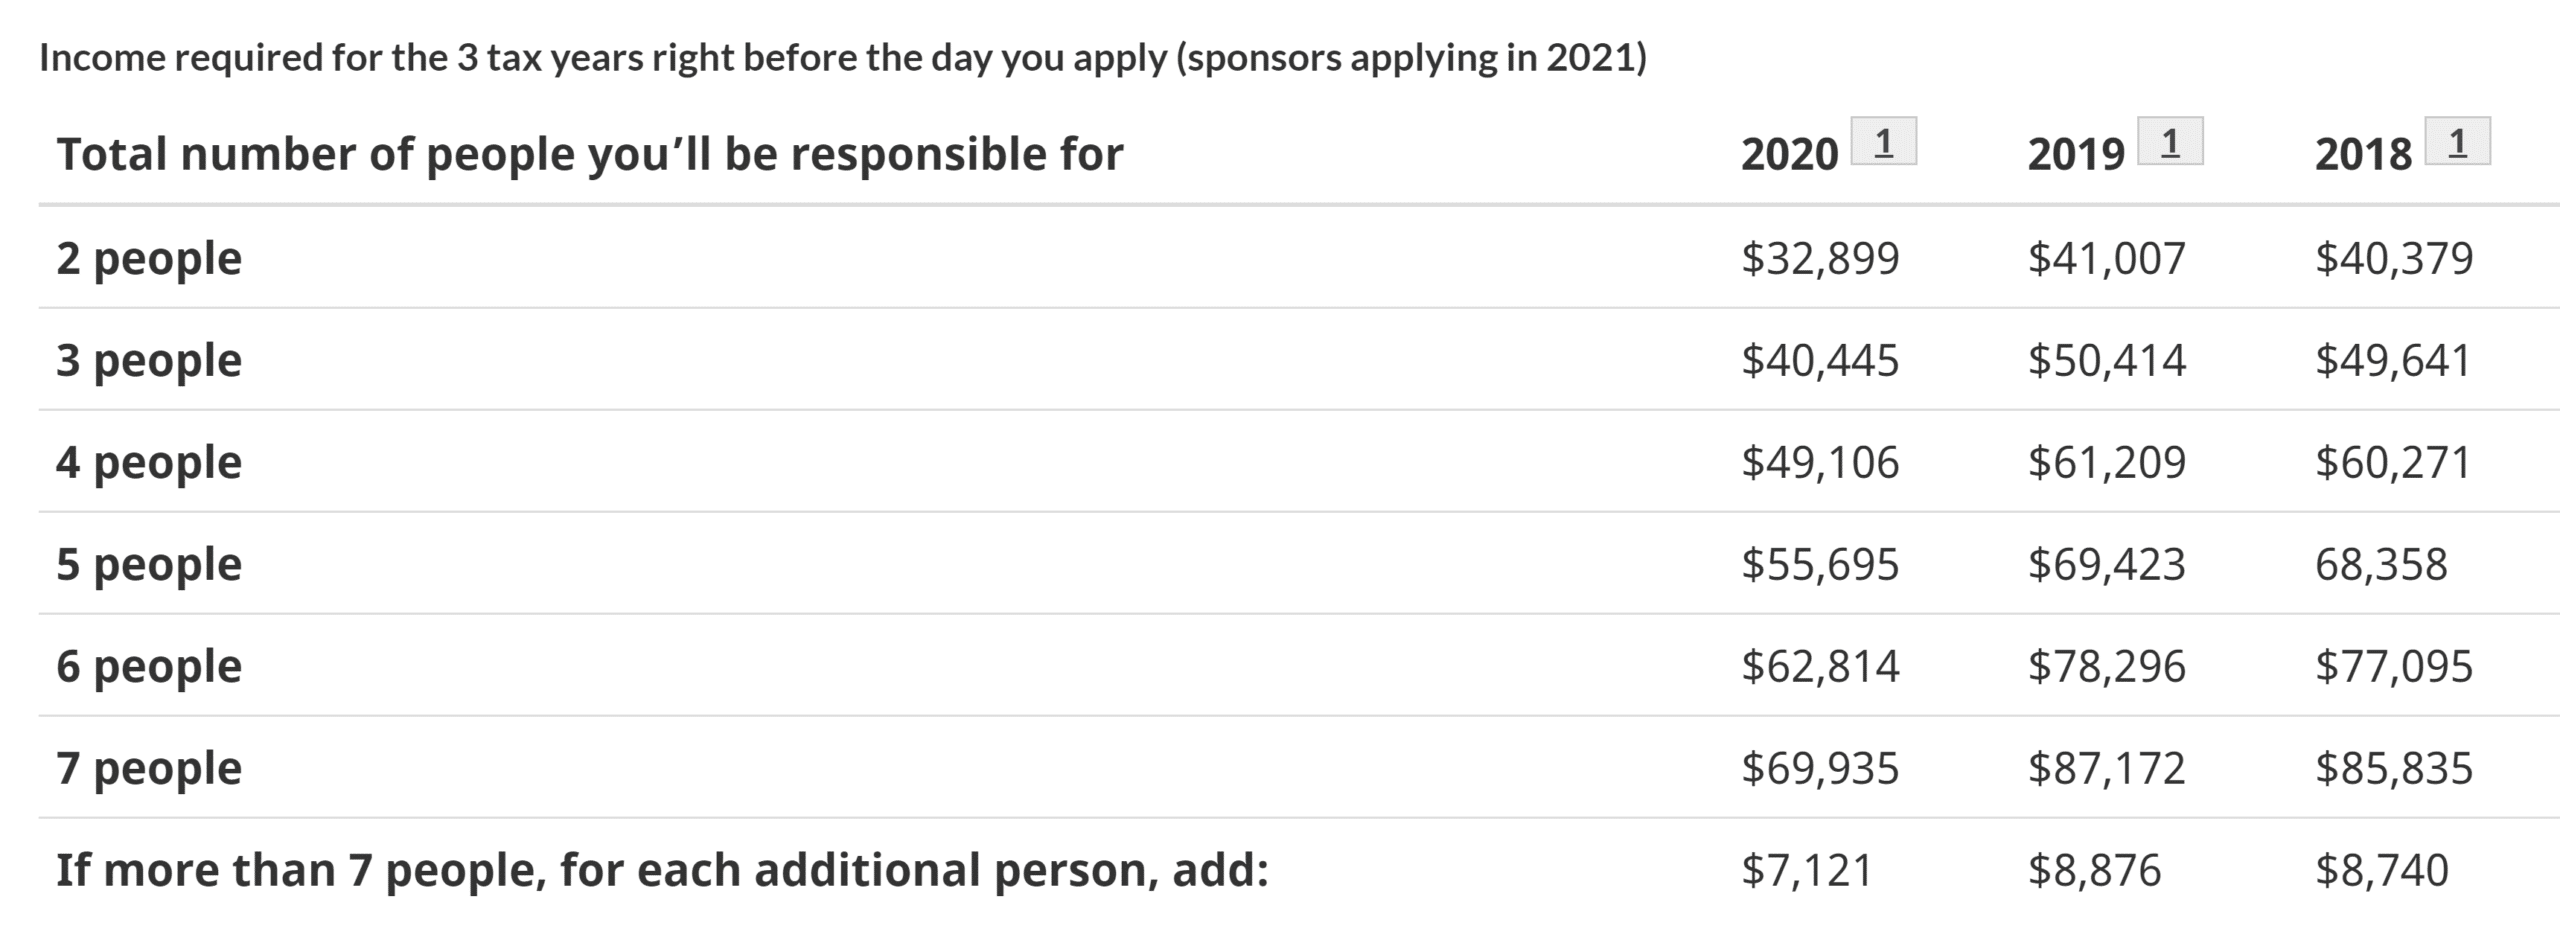 Parents and grandparents program 2020 minimum necessary income requirement